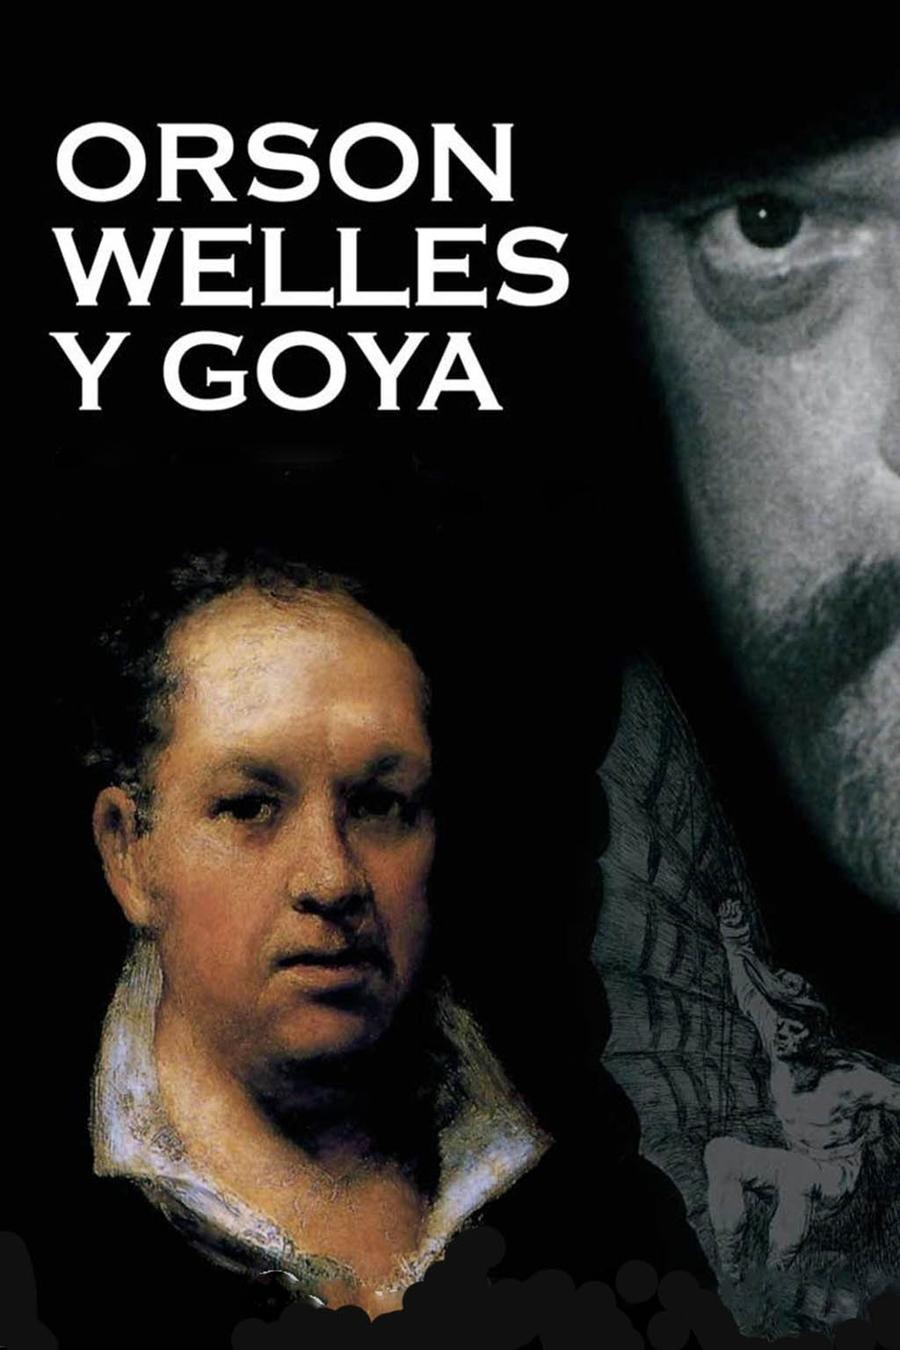 Orson Welles y Goya